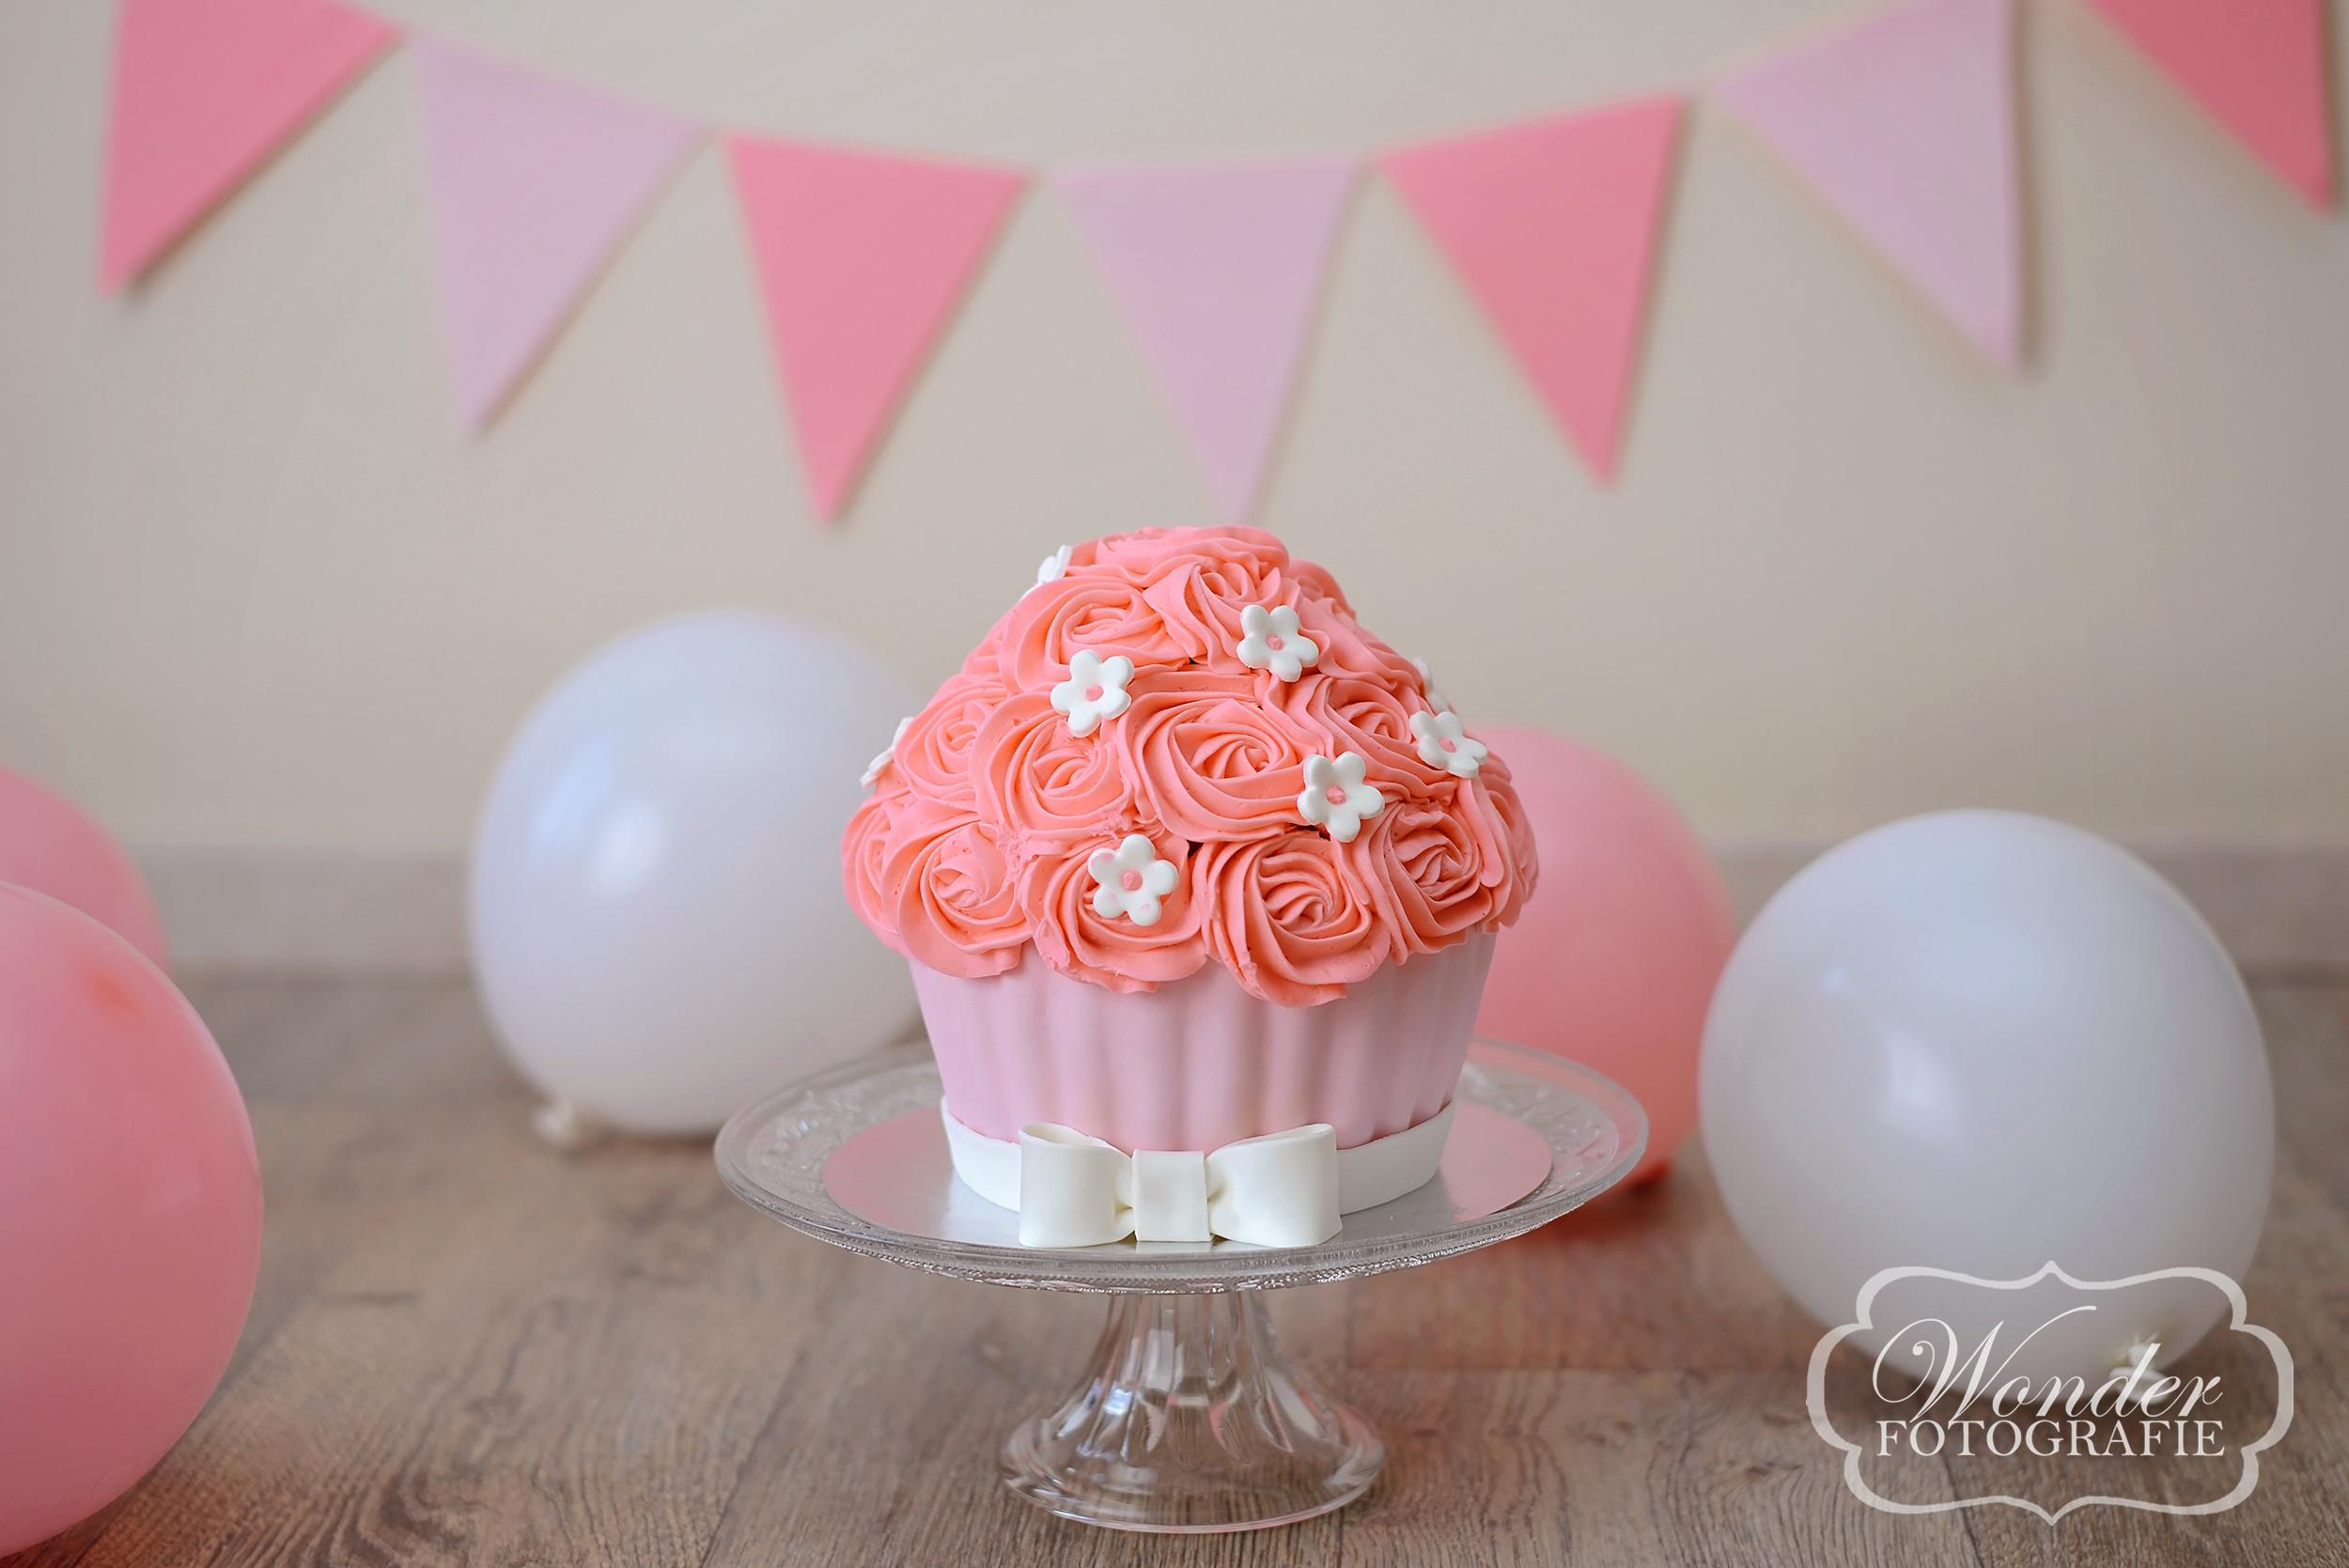 Cake Smash RozeCreme - Wonder Fotografie